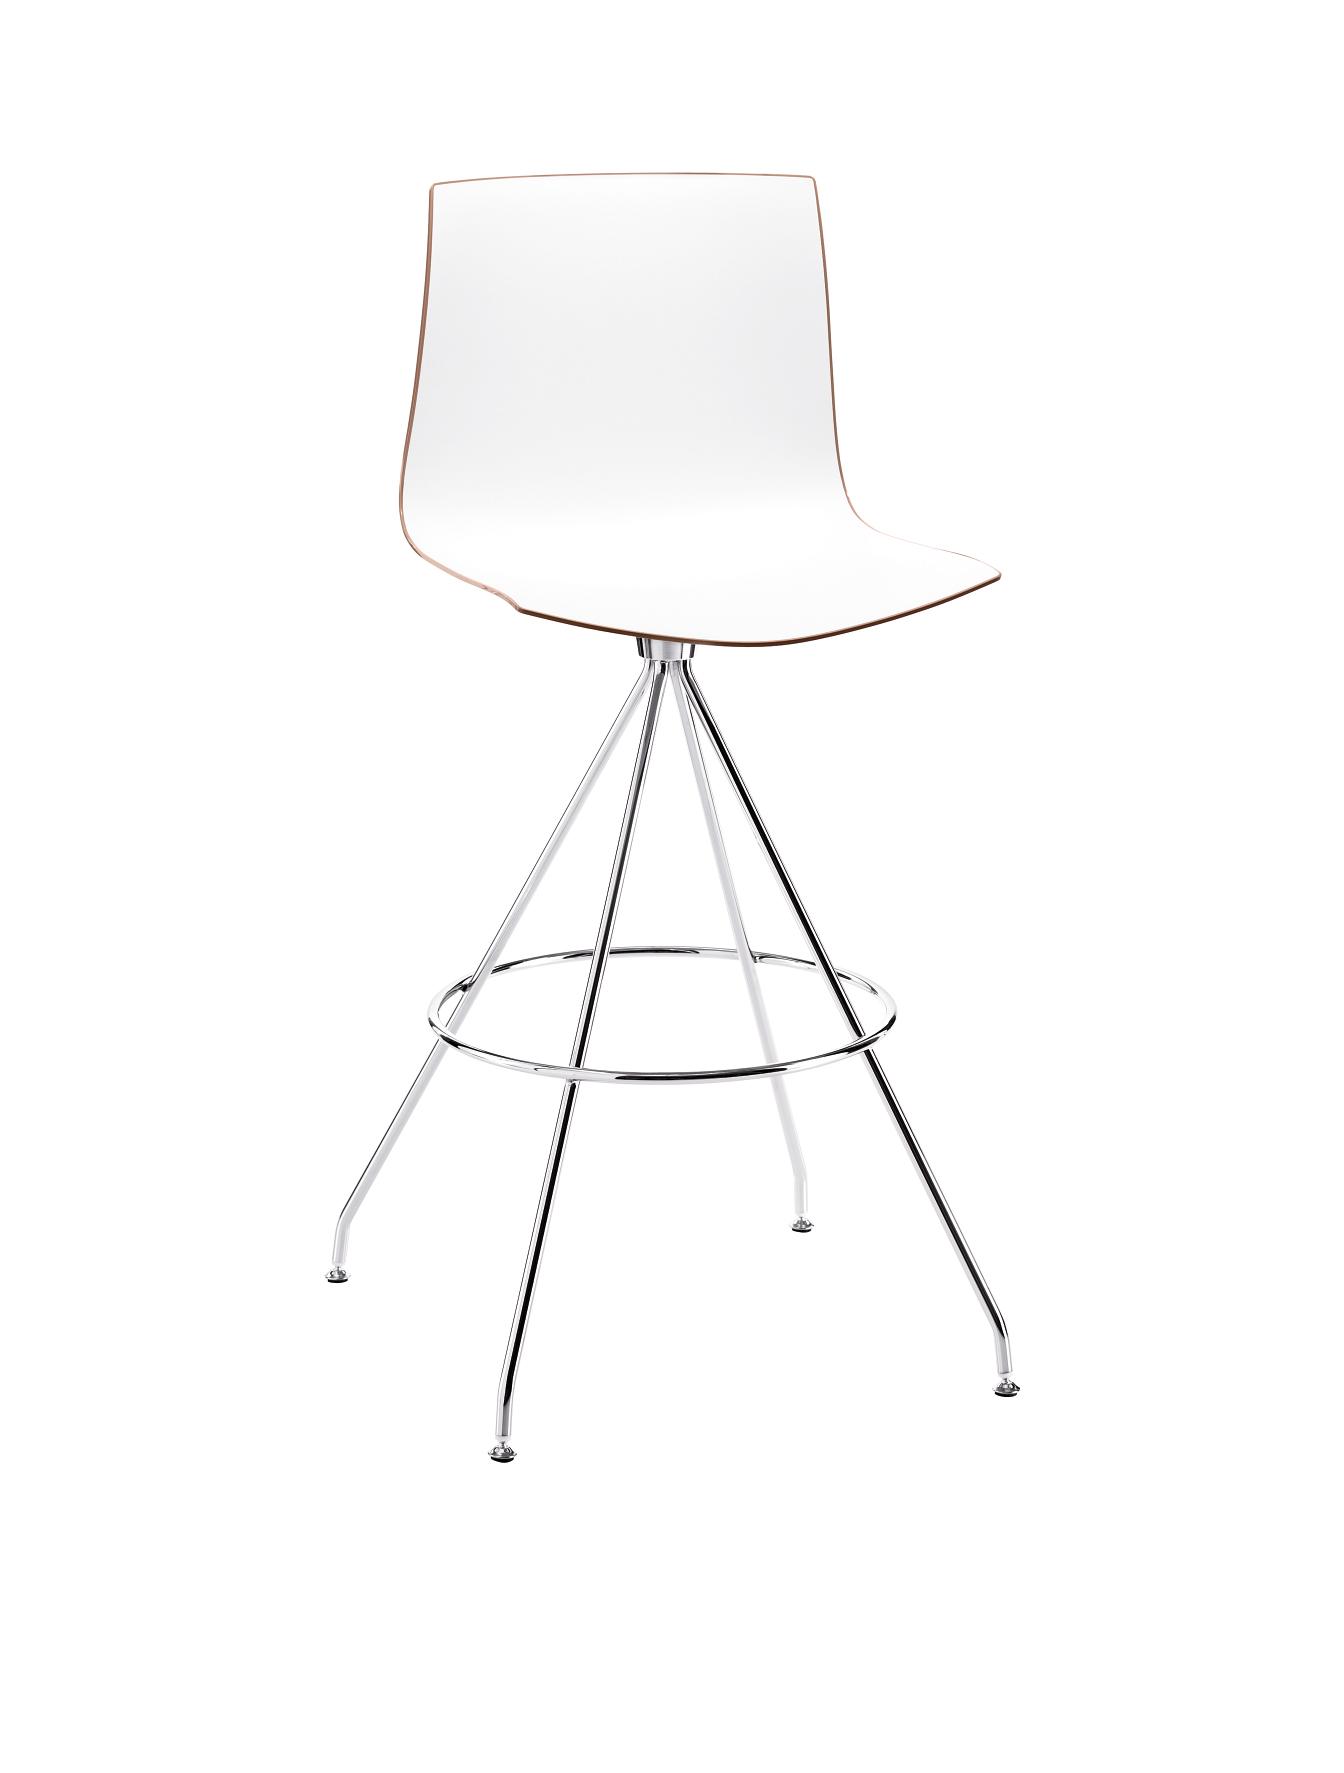 Catifa46 0487 chair by Arper